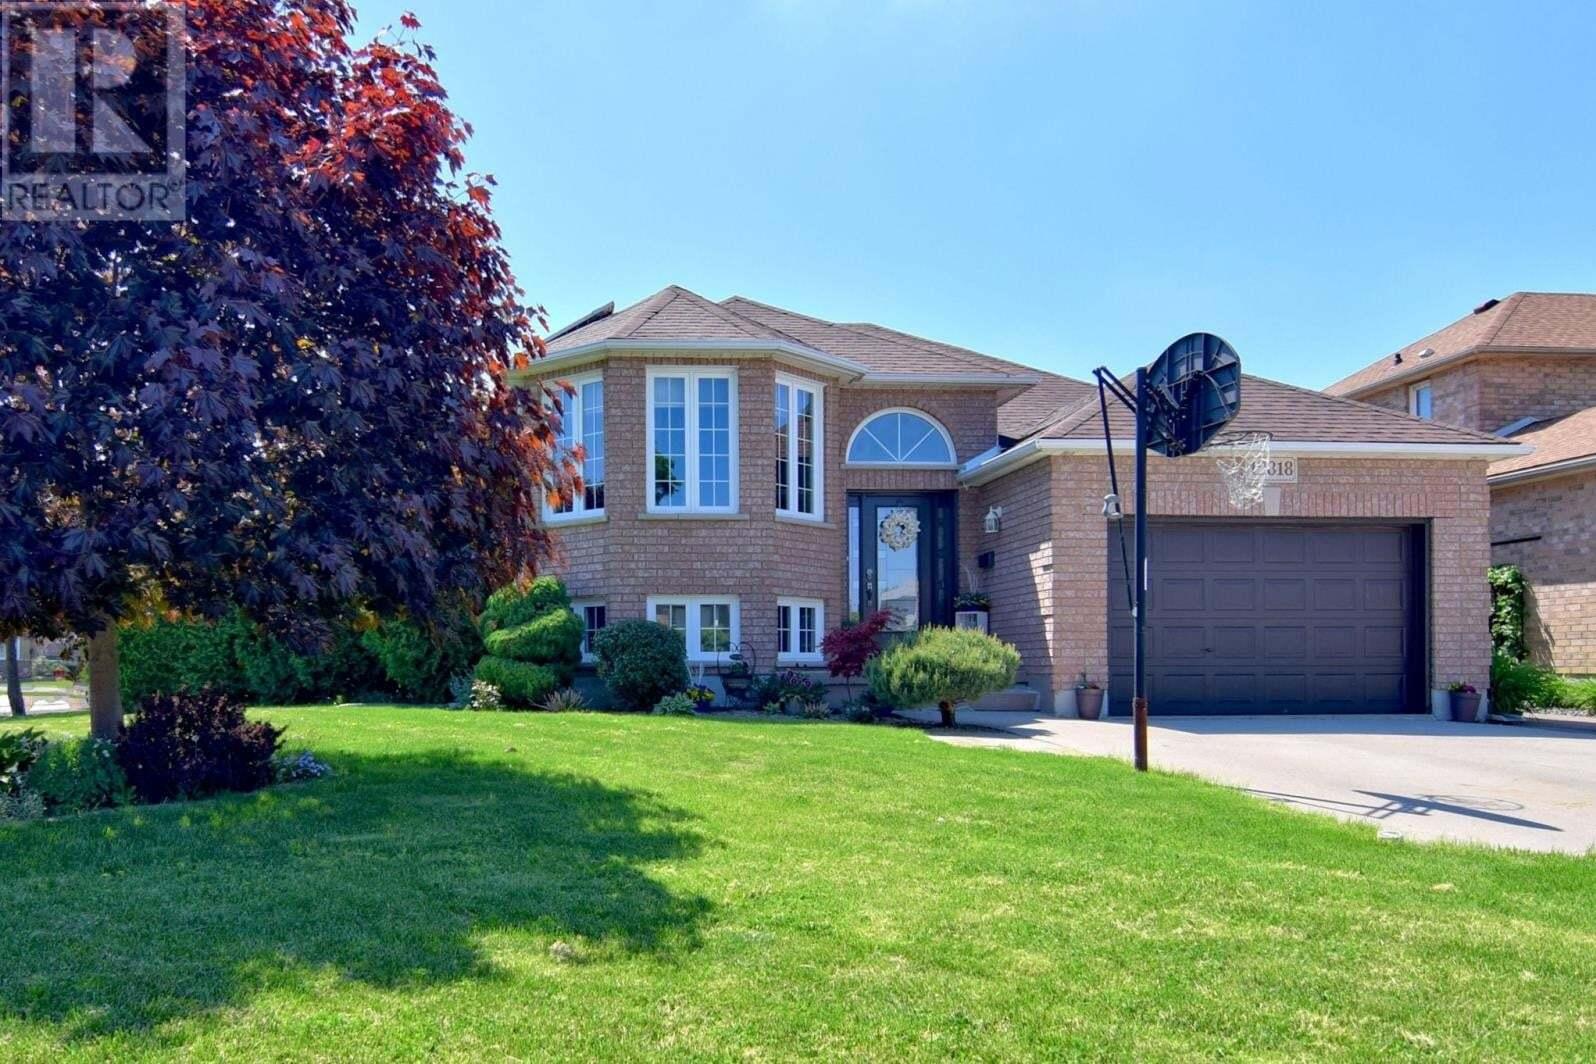 House for sale at 12818 Lanoue  Tecumseh Ontario - MLS: 20005988